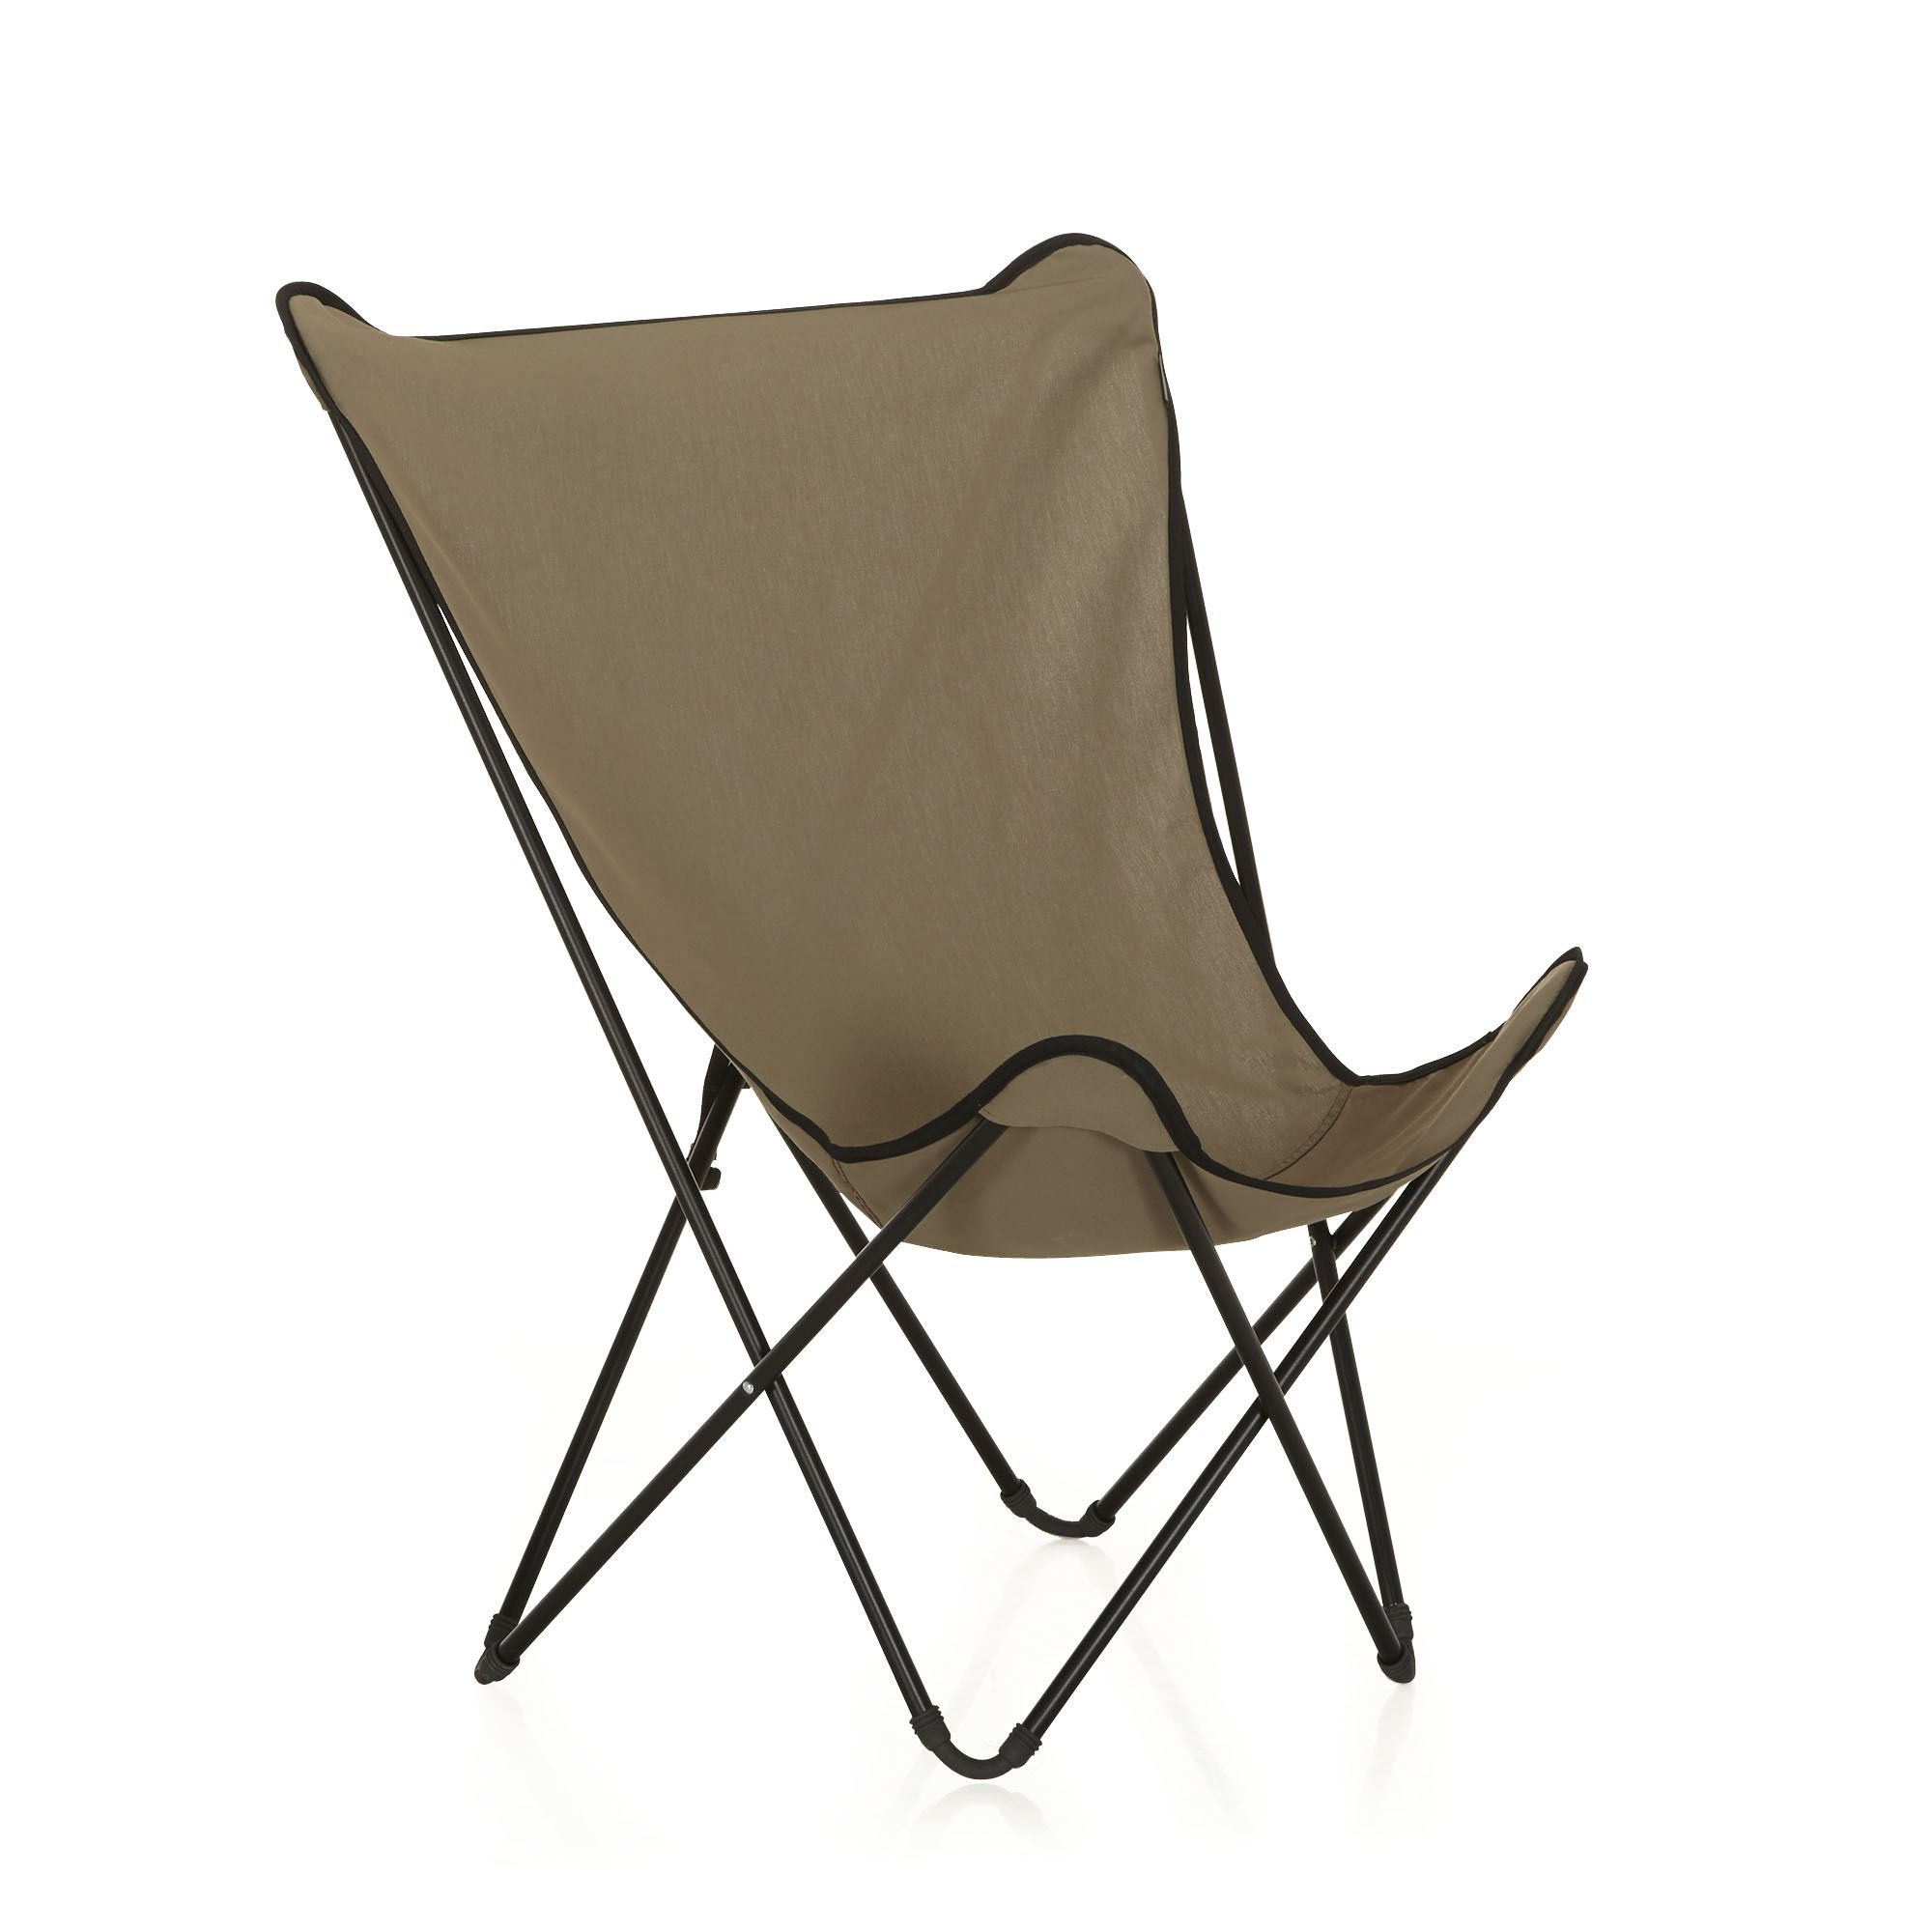 Lafuma Pop Up Chairs Teal Folding Chair Fauteuil De Repos Pliant Beige Maxi